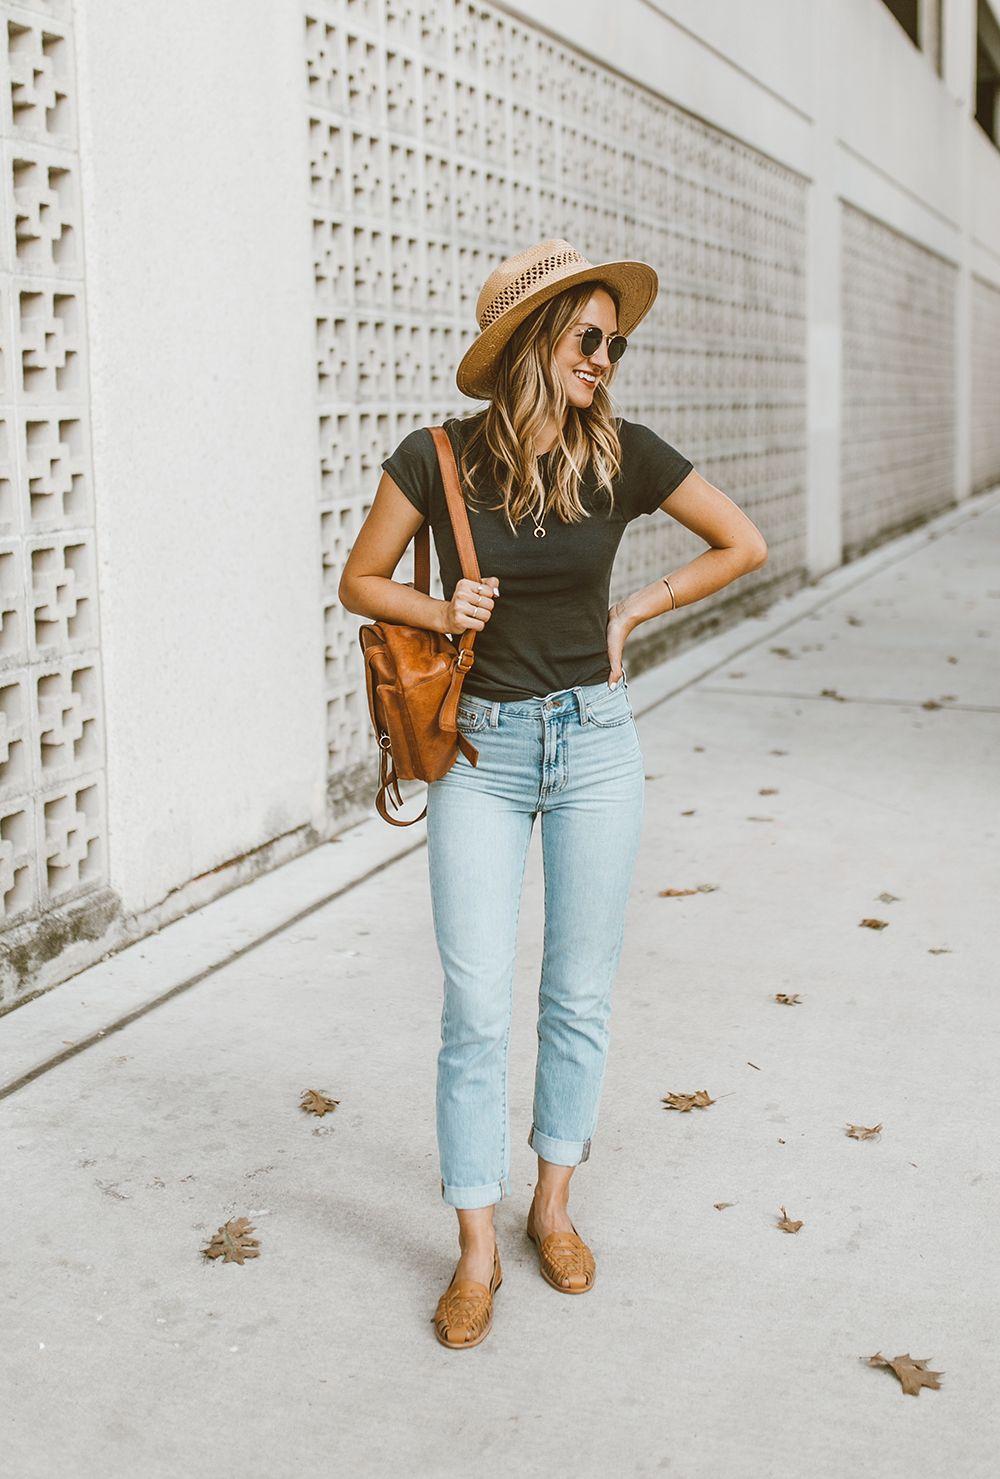 f86fa56873b livvyland-blog-olivia-watson-austin-texas-fashion-style-blog -nisolo-ecuador-huarche-sandals-almond-tee-jeans-outfit-1